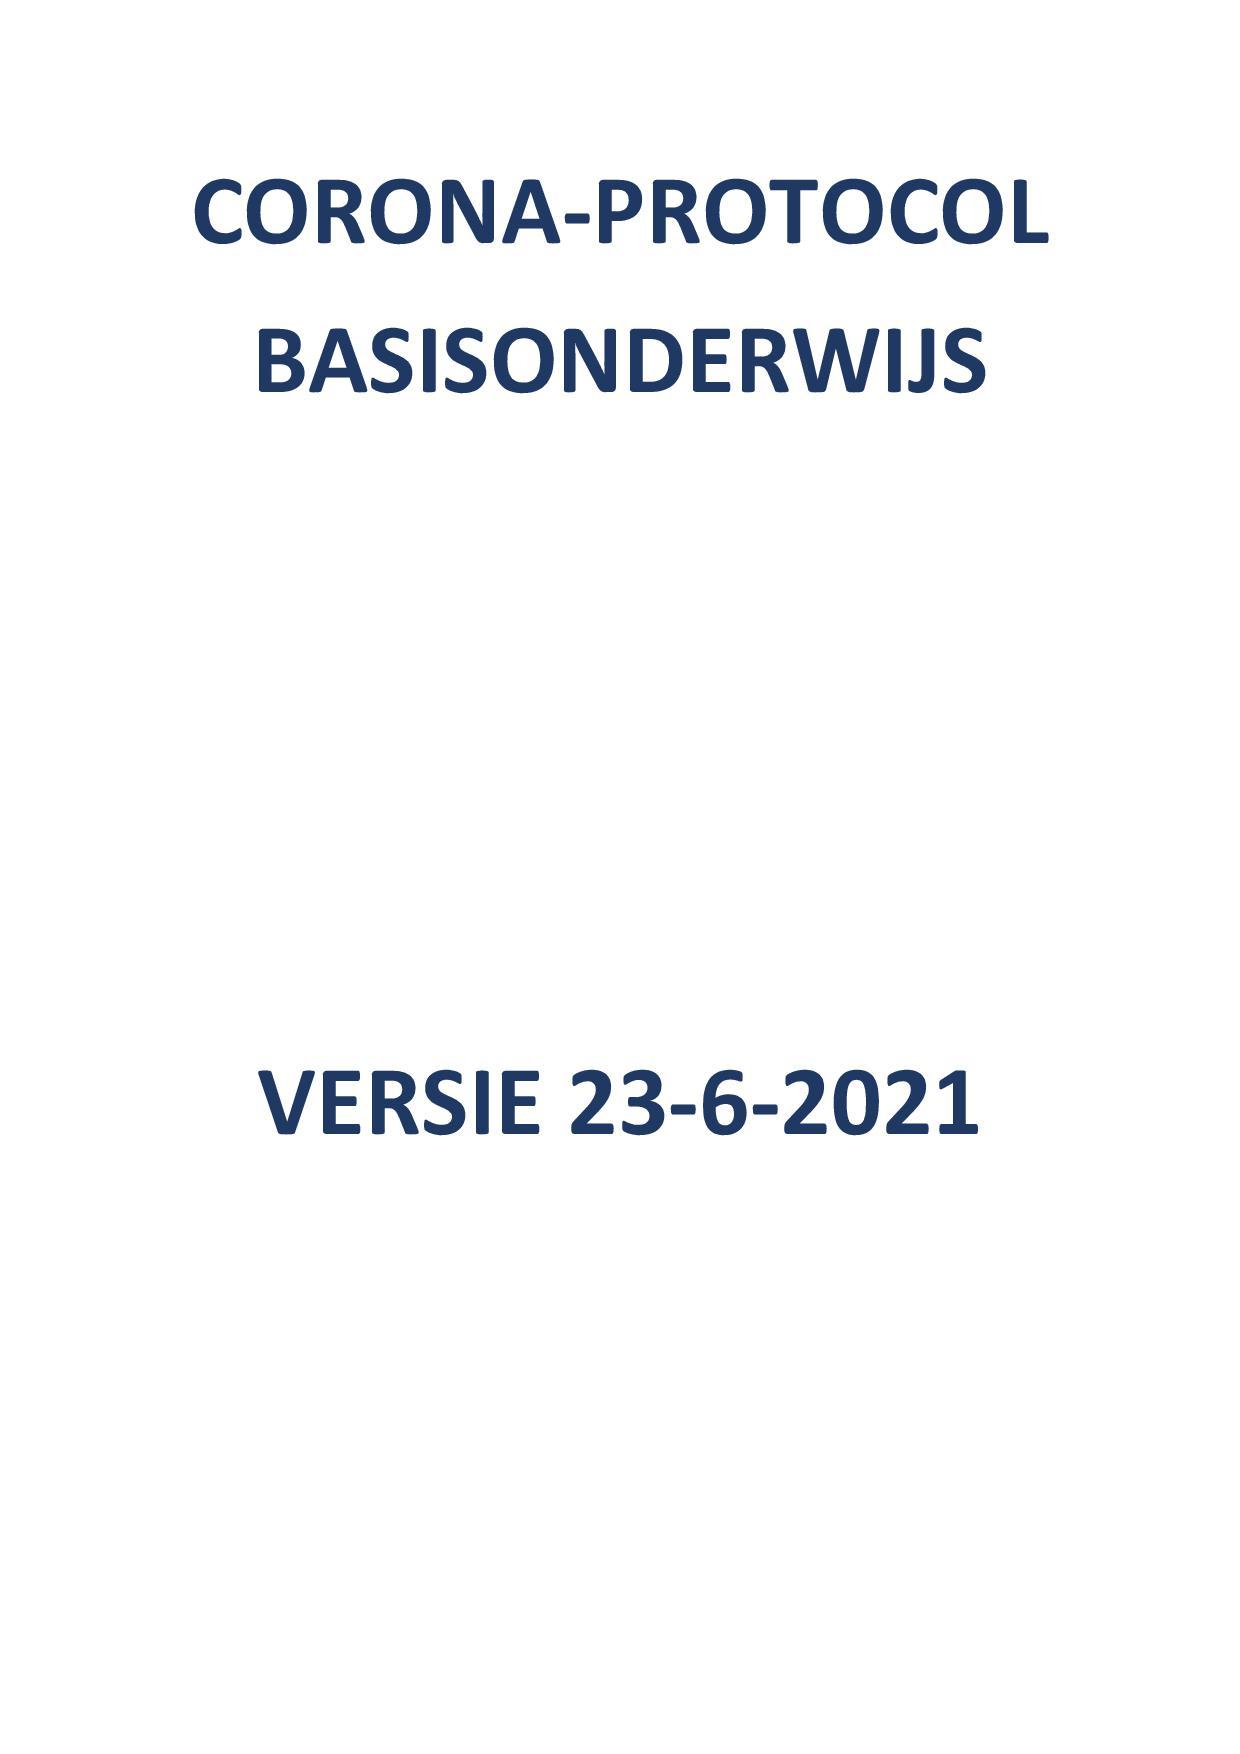 Corona-protocol Basisonderwijs Versie 23-6-2021